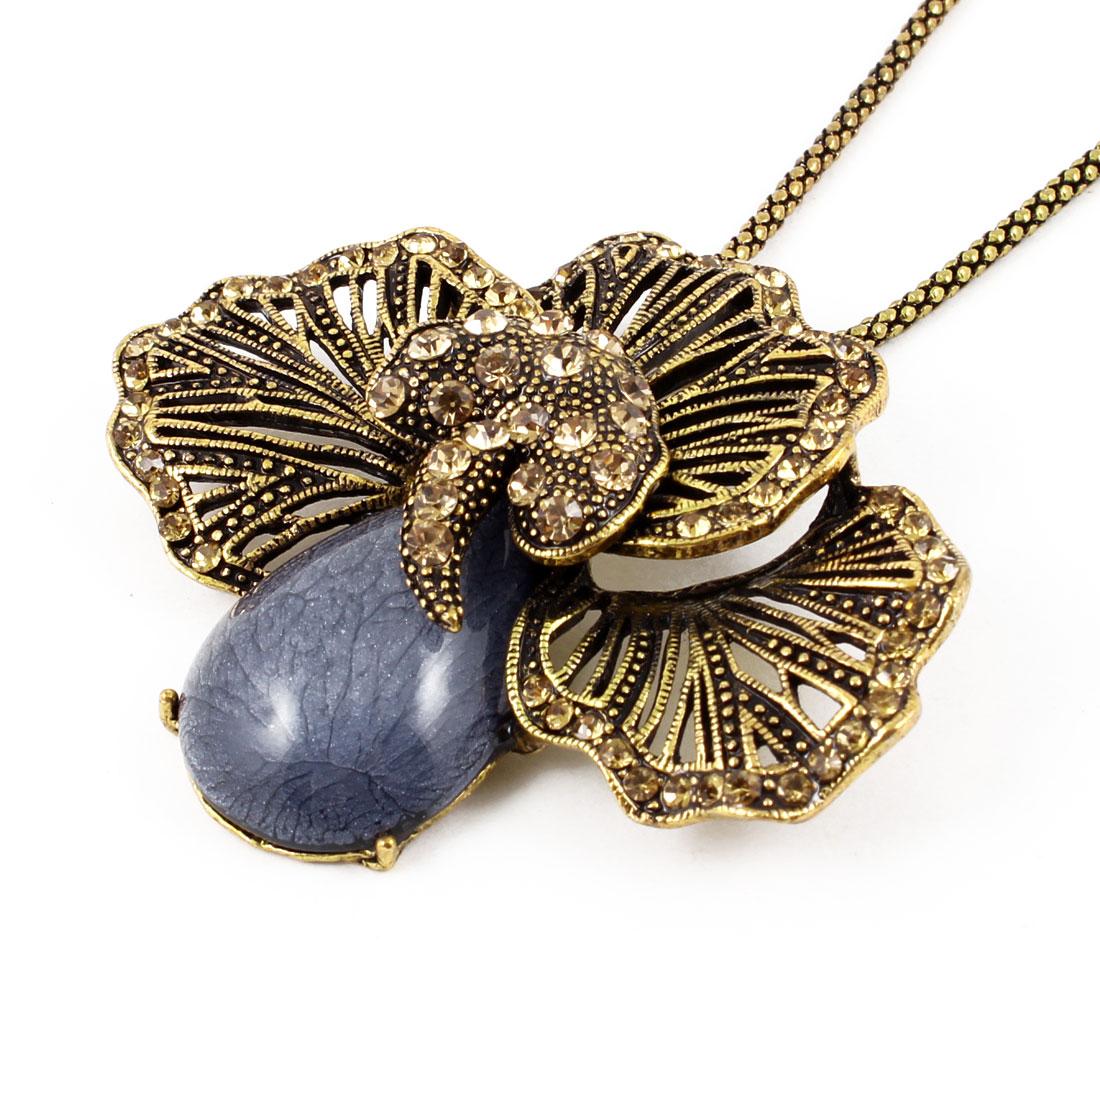 Woman Slateblue Raindrop Stone Decor Gold Tone Alloy Chains Sweater Necklace